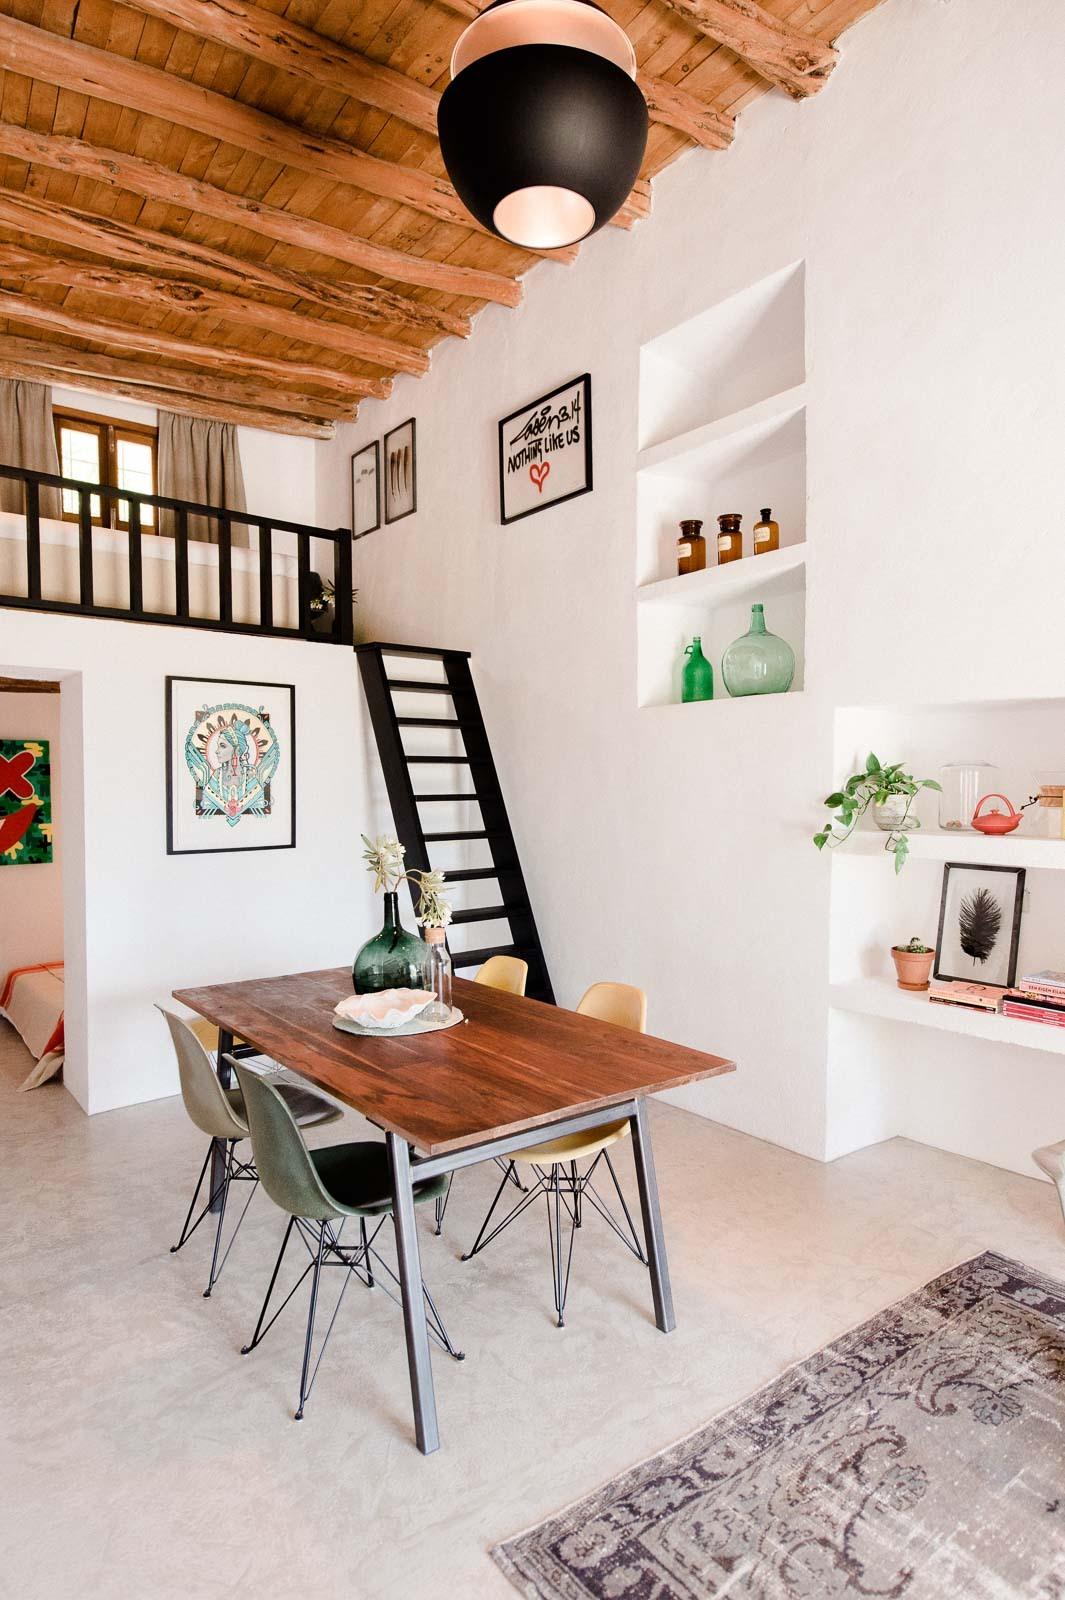 Una piccola casa di campagna a ibiza - Documenti per affittare una casa ...